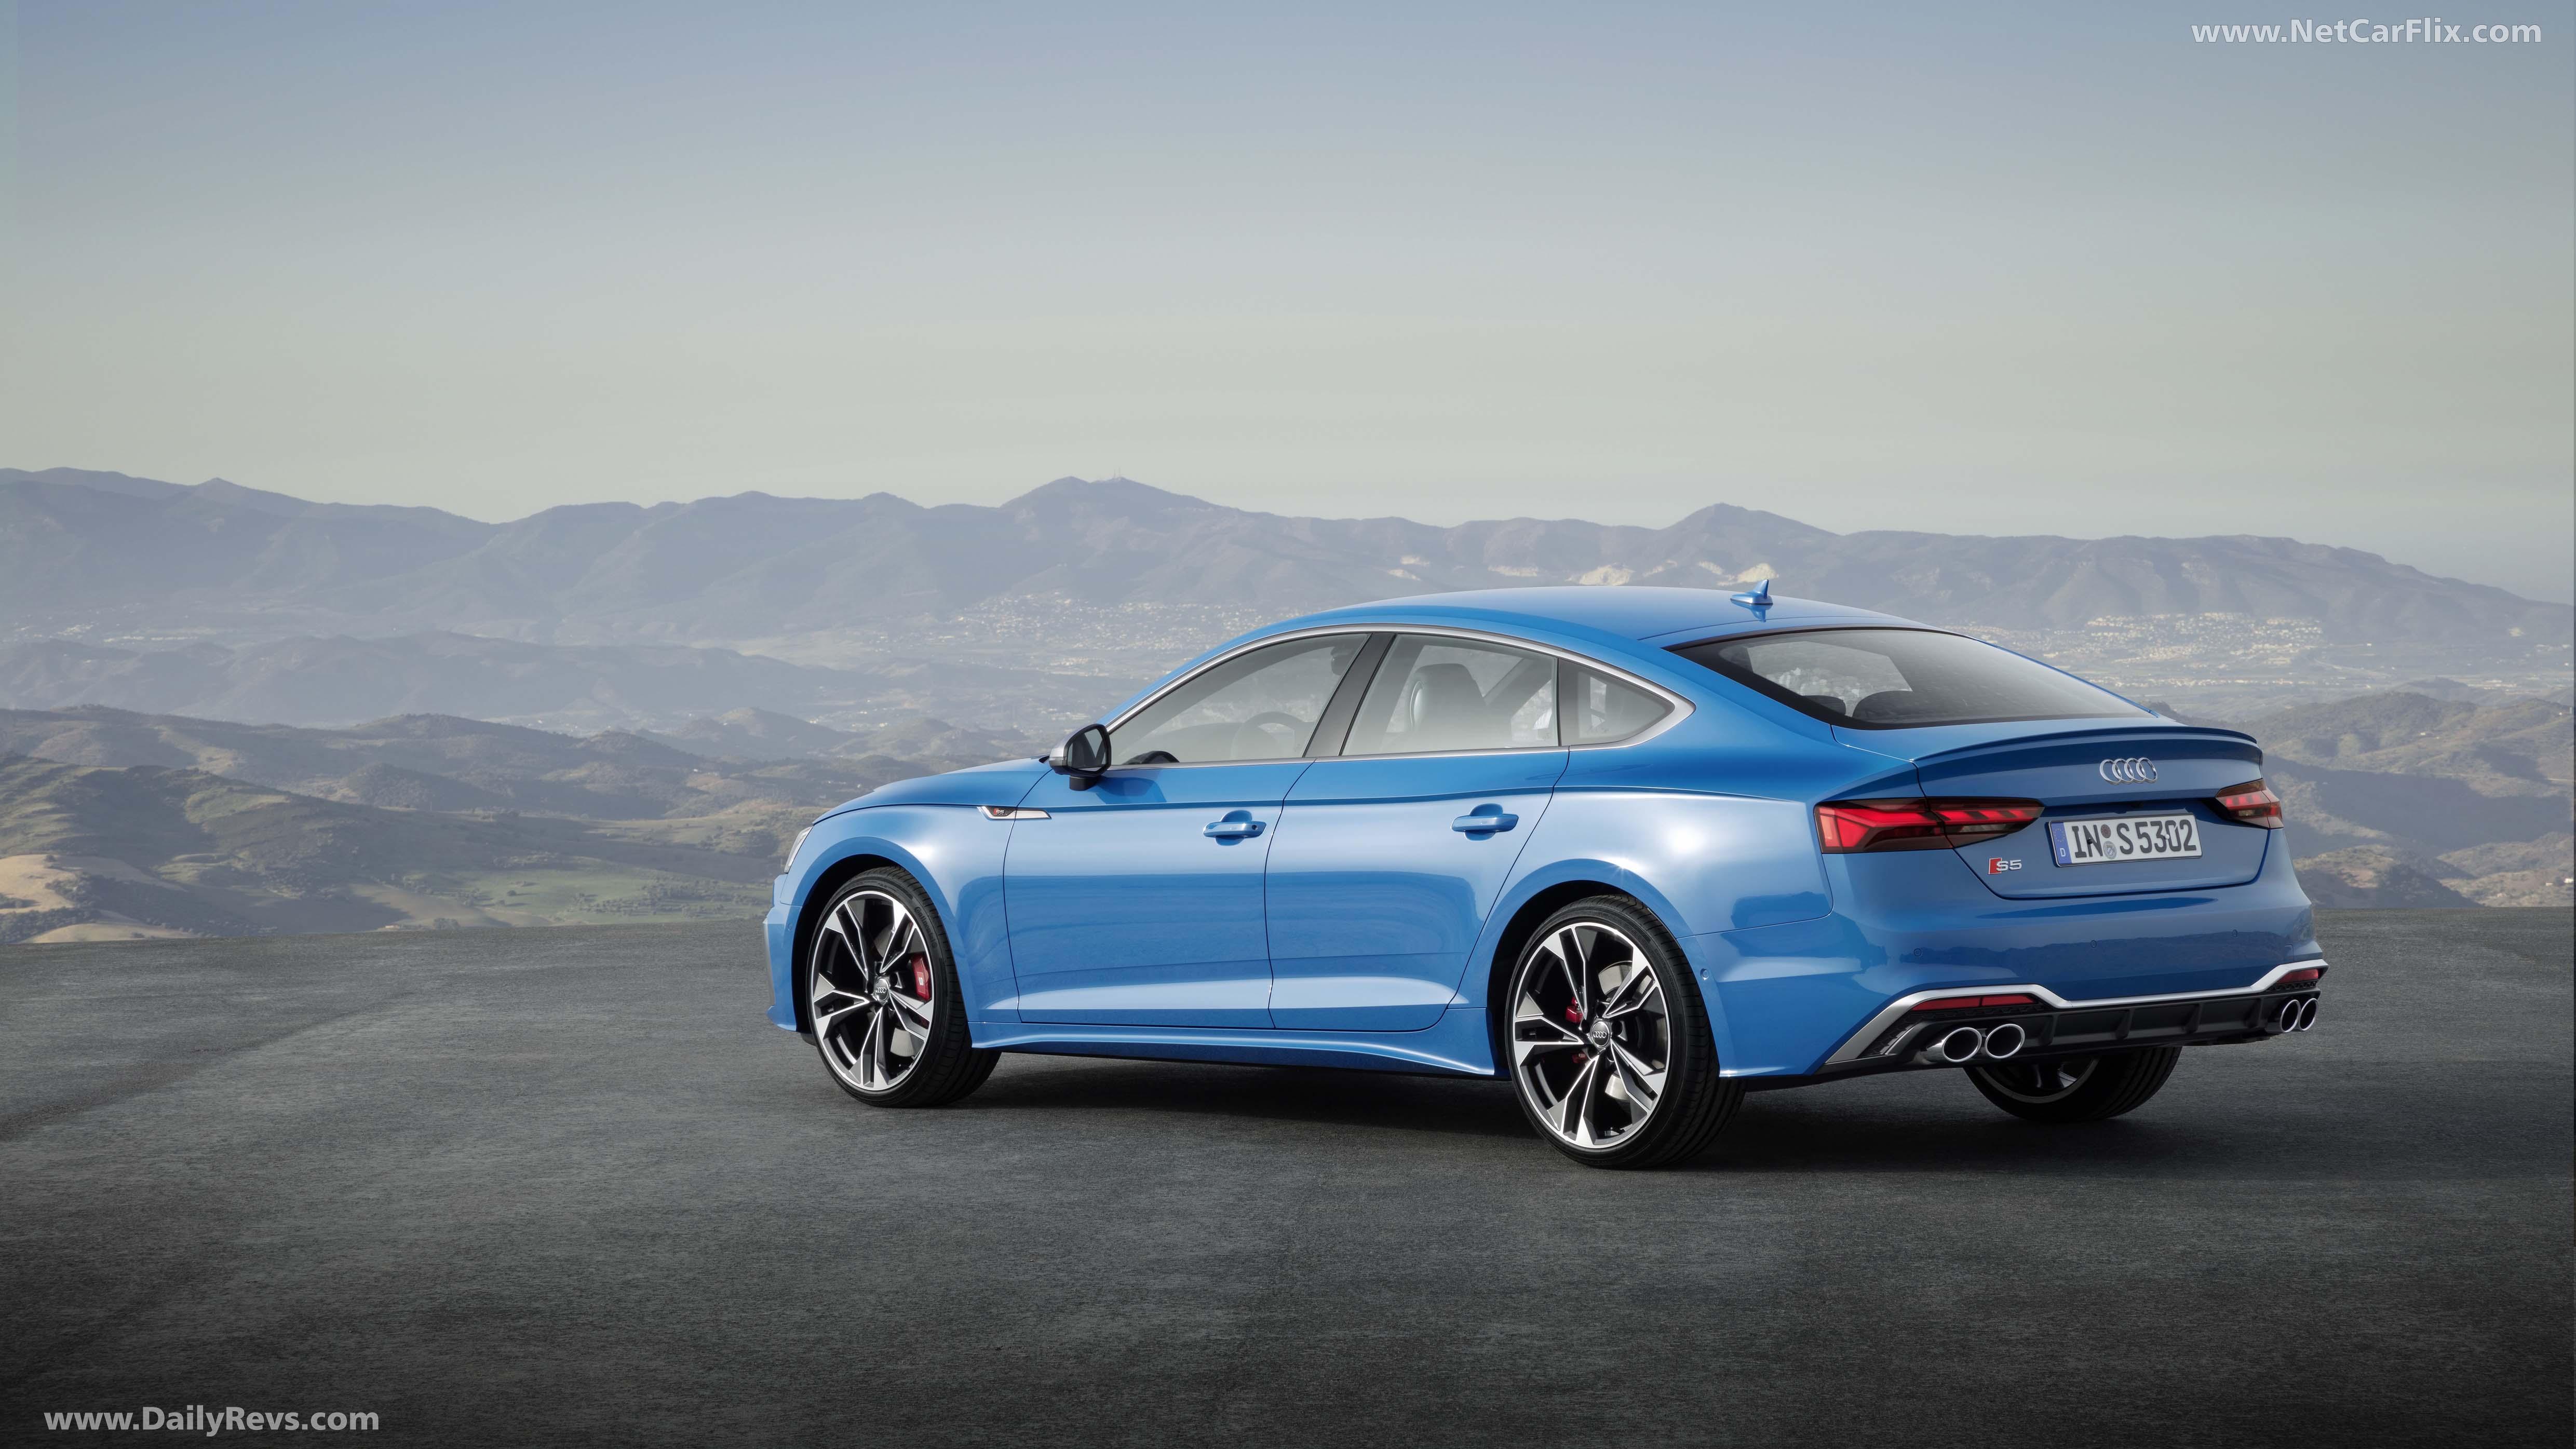 2020 Audi S5 Sportback TDI - Pictures, Images, Photos ...